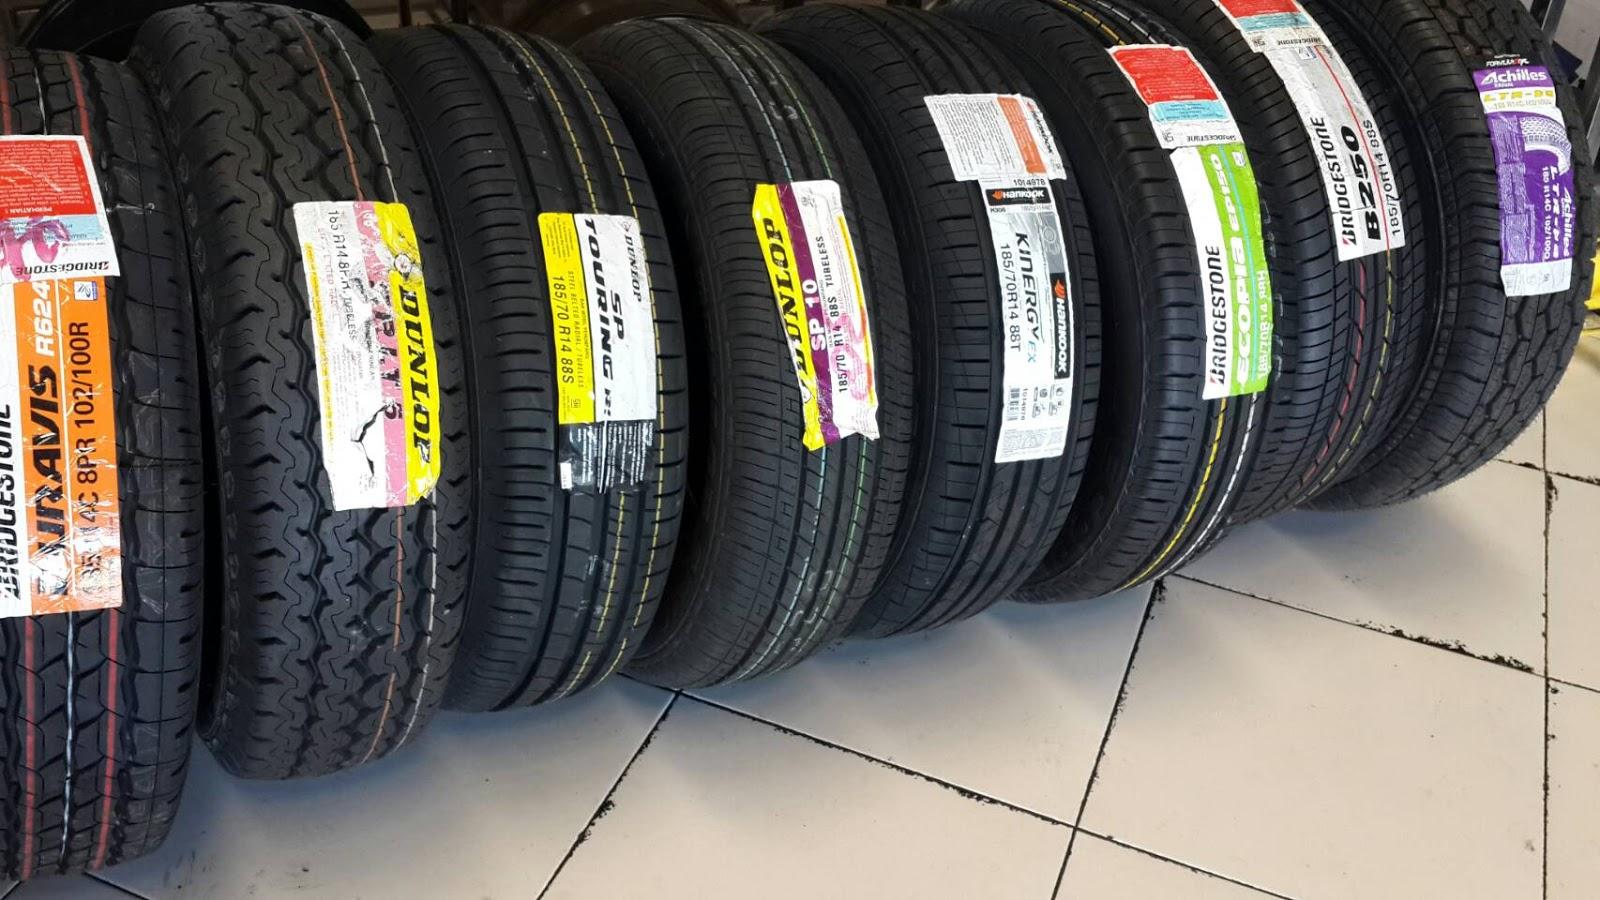 Harga Jual Ban Ukuran 185 70 R 14 Bs Ecopia 550000 Spek Mobil Bridgestone New Techno Tecaz 60r15 Vocer Uk185 Tahun 2016 Merk 1 B250 Rp 585000 500000 450000